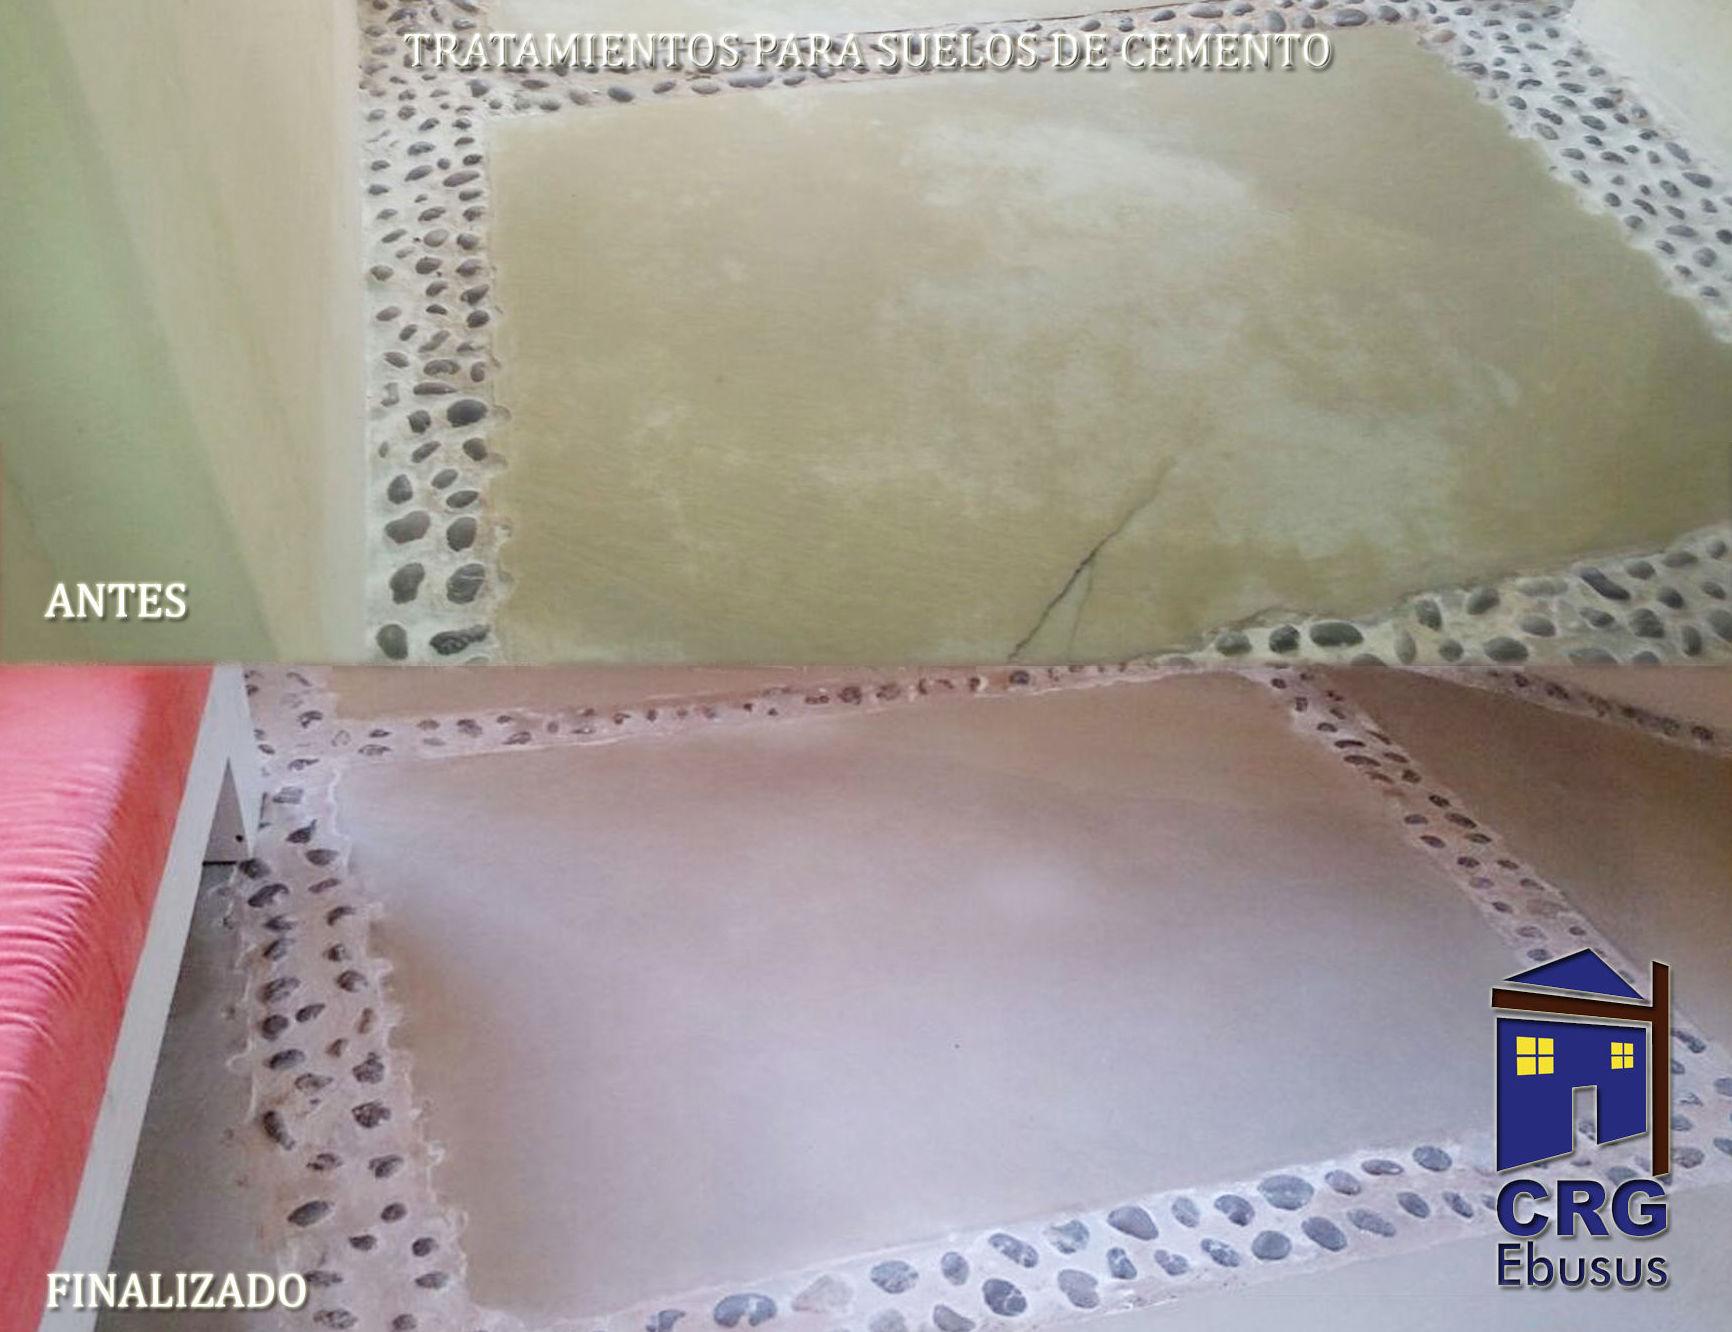 Treatment of concrete floors